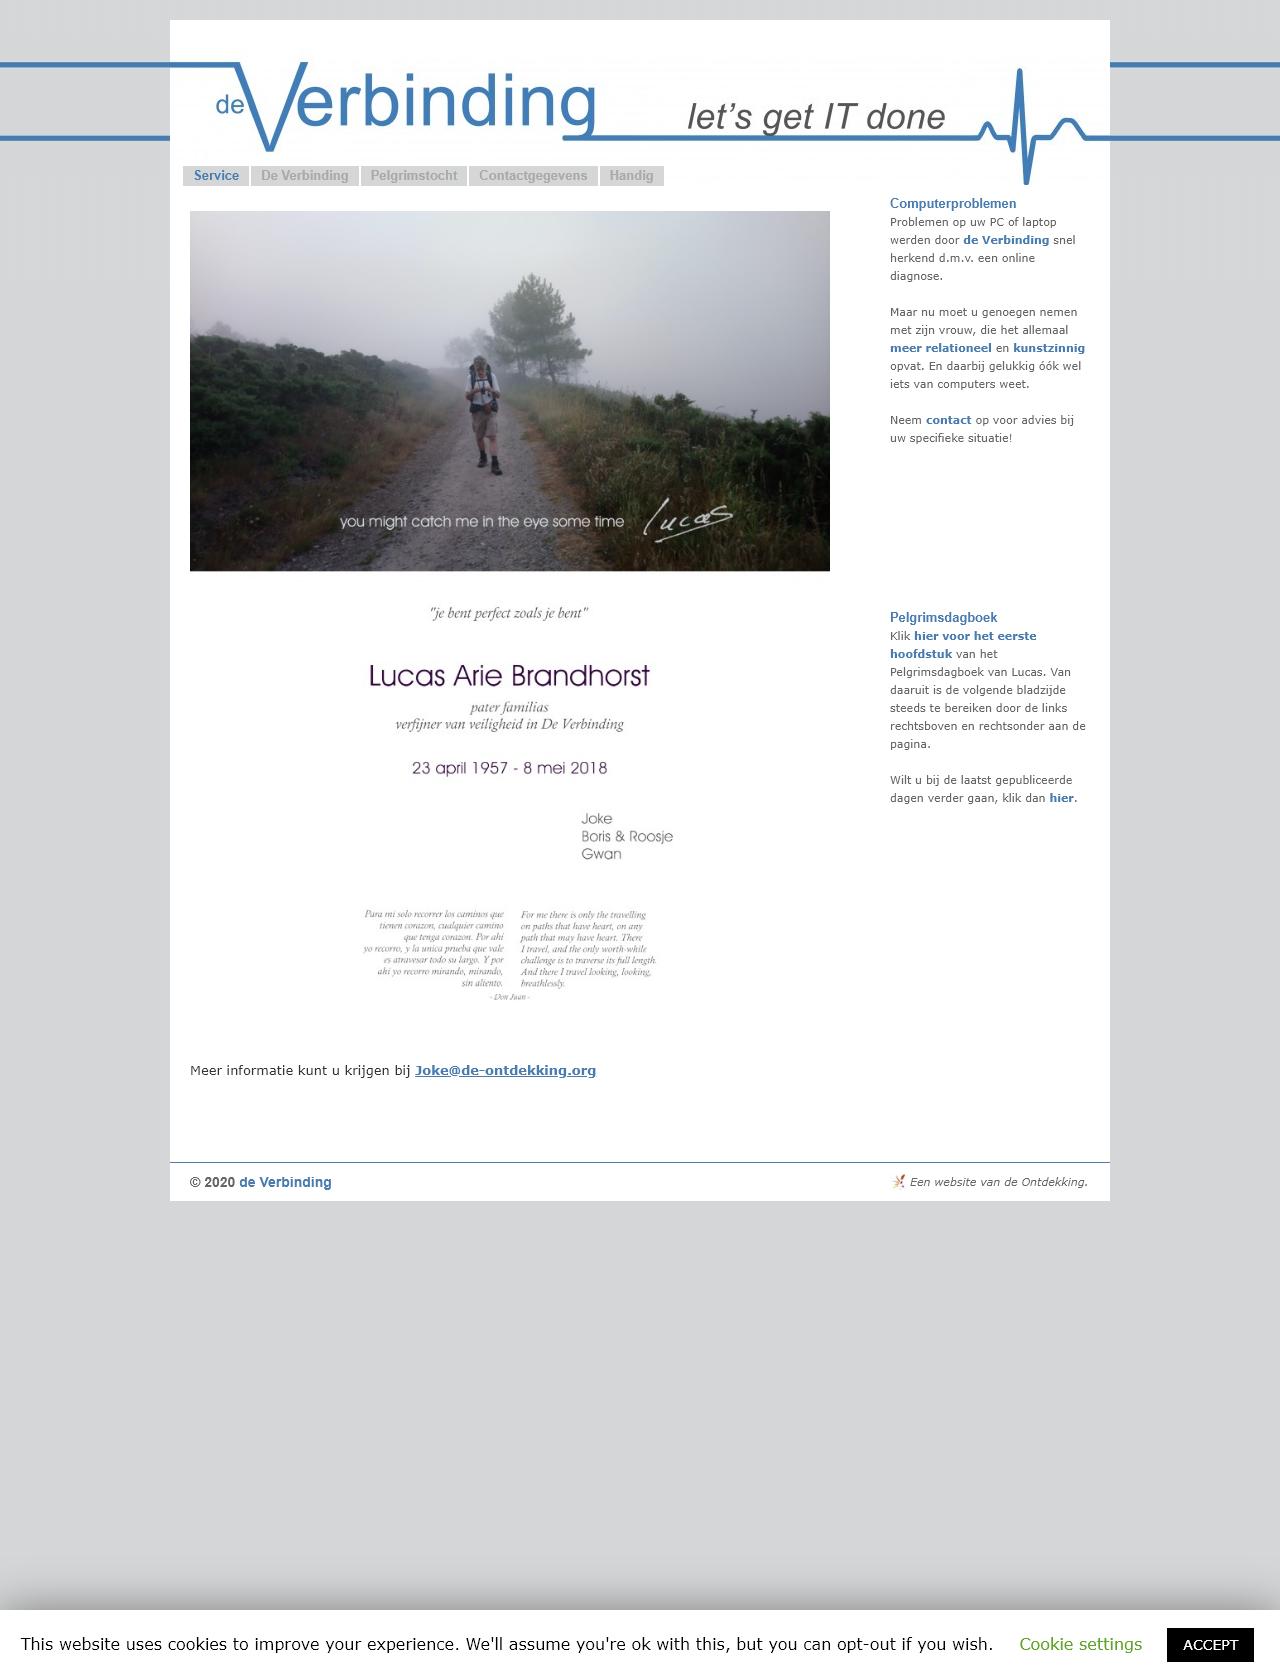 Screenshot Desktop - https://deverbinding.nu/